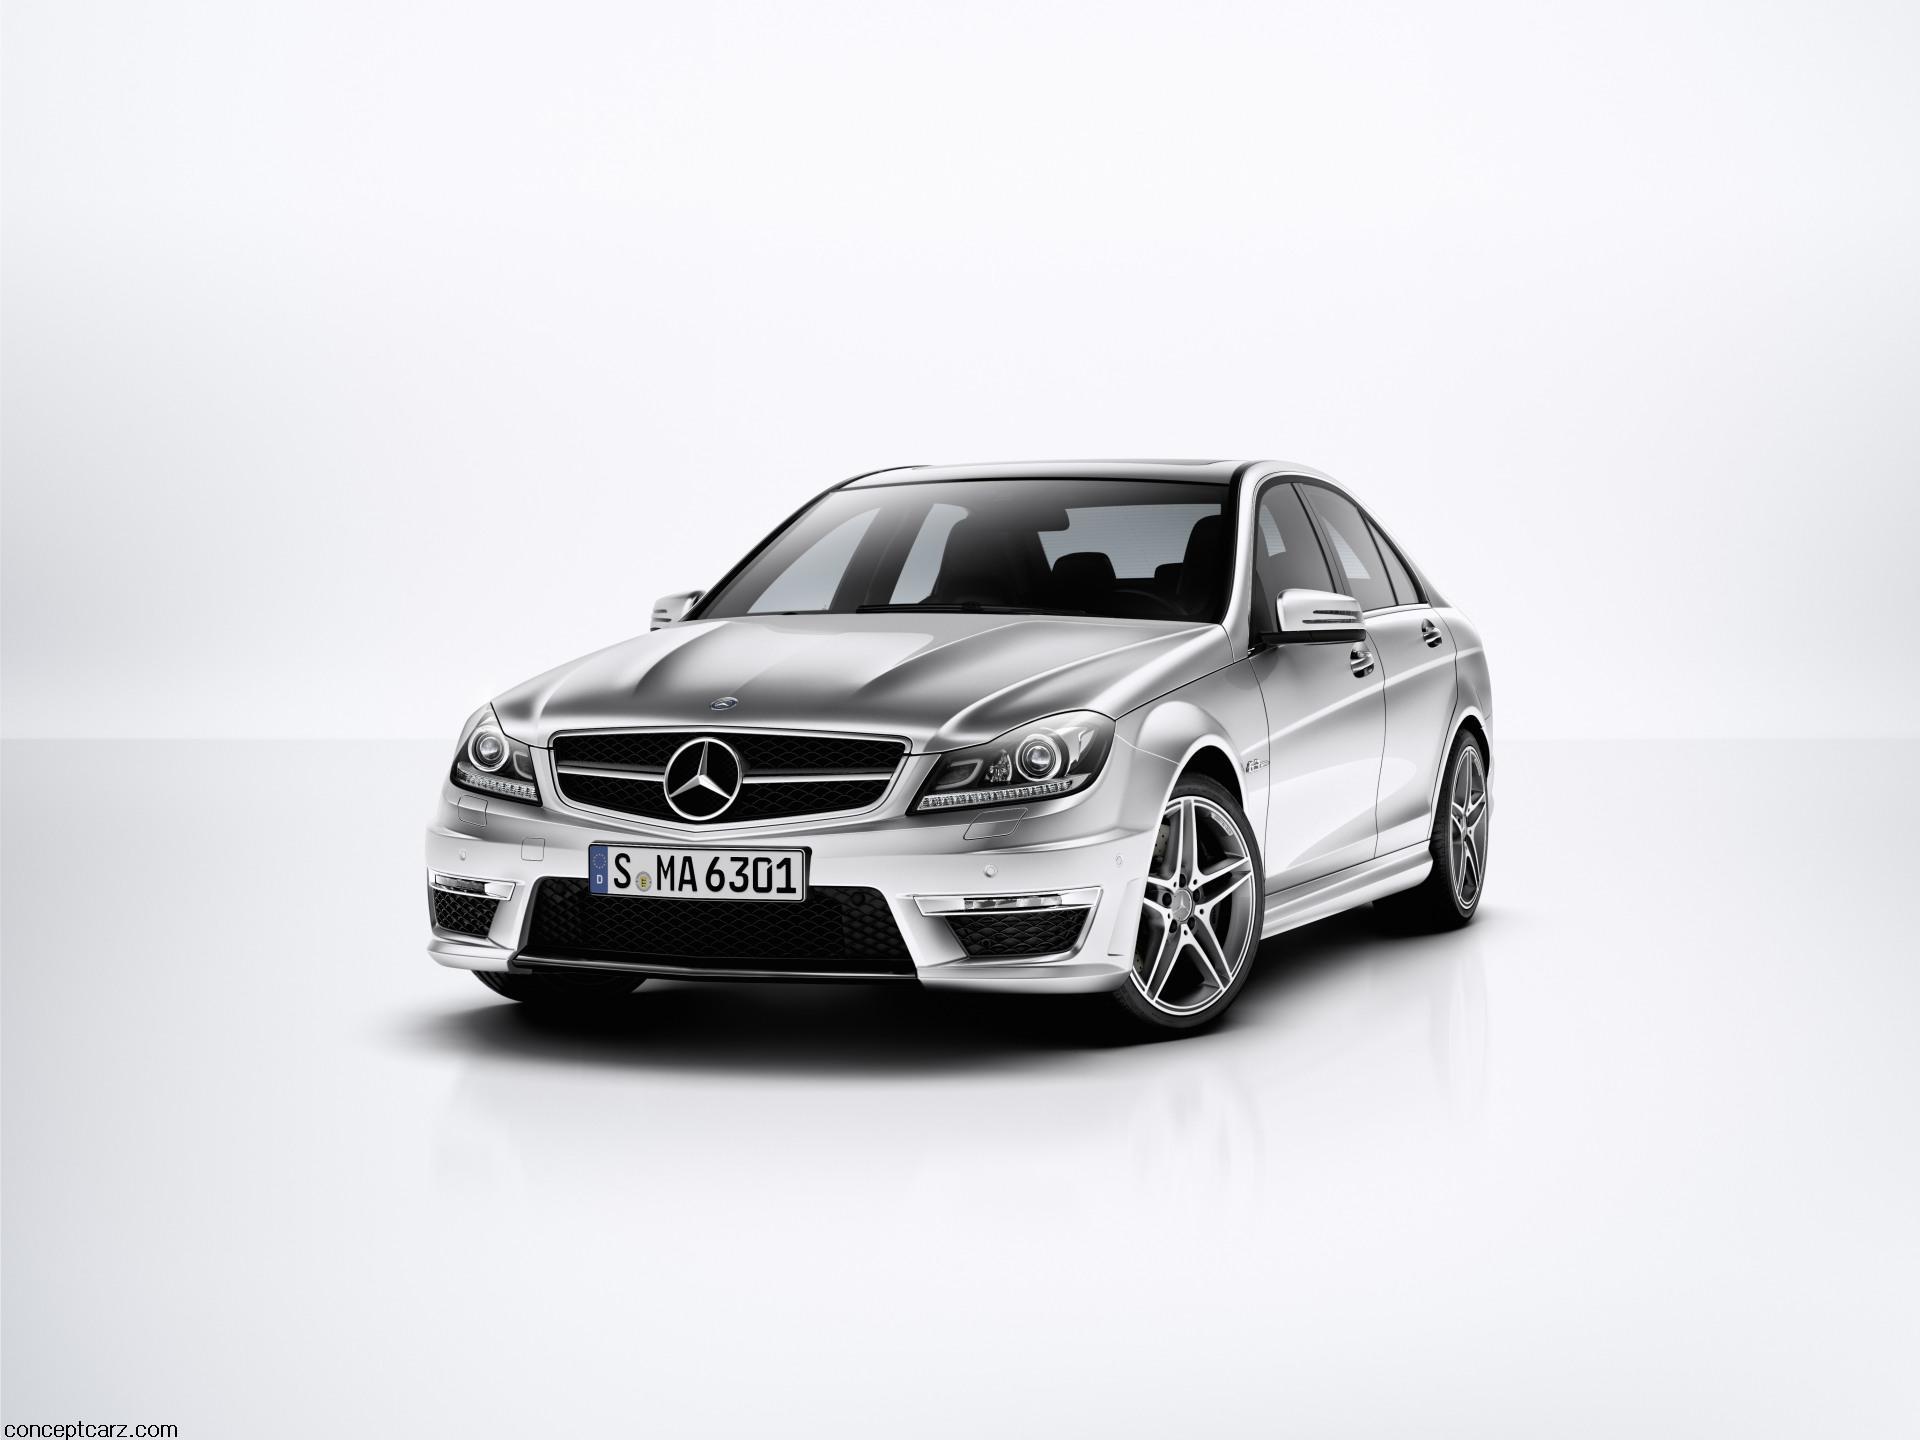 2012 Mercedes-Benz C63 AMG Image